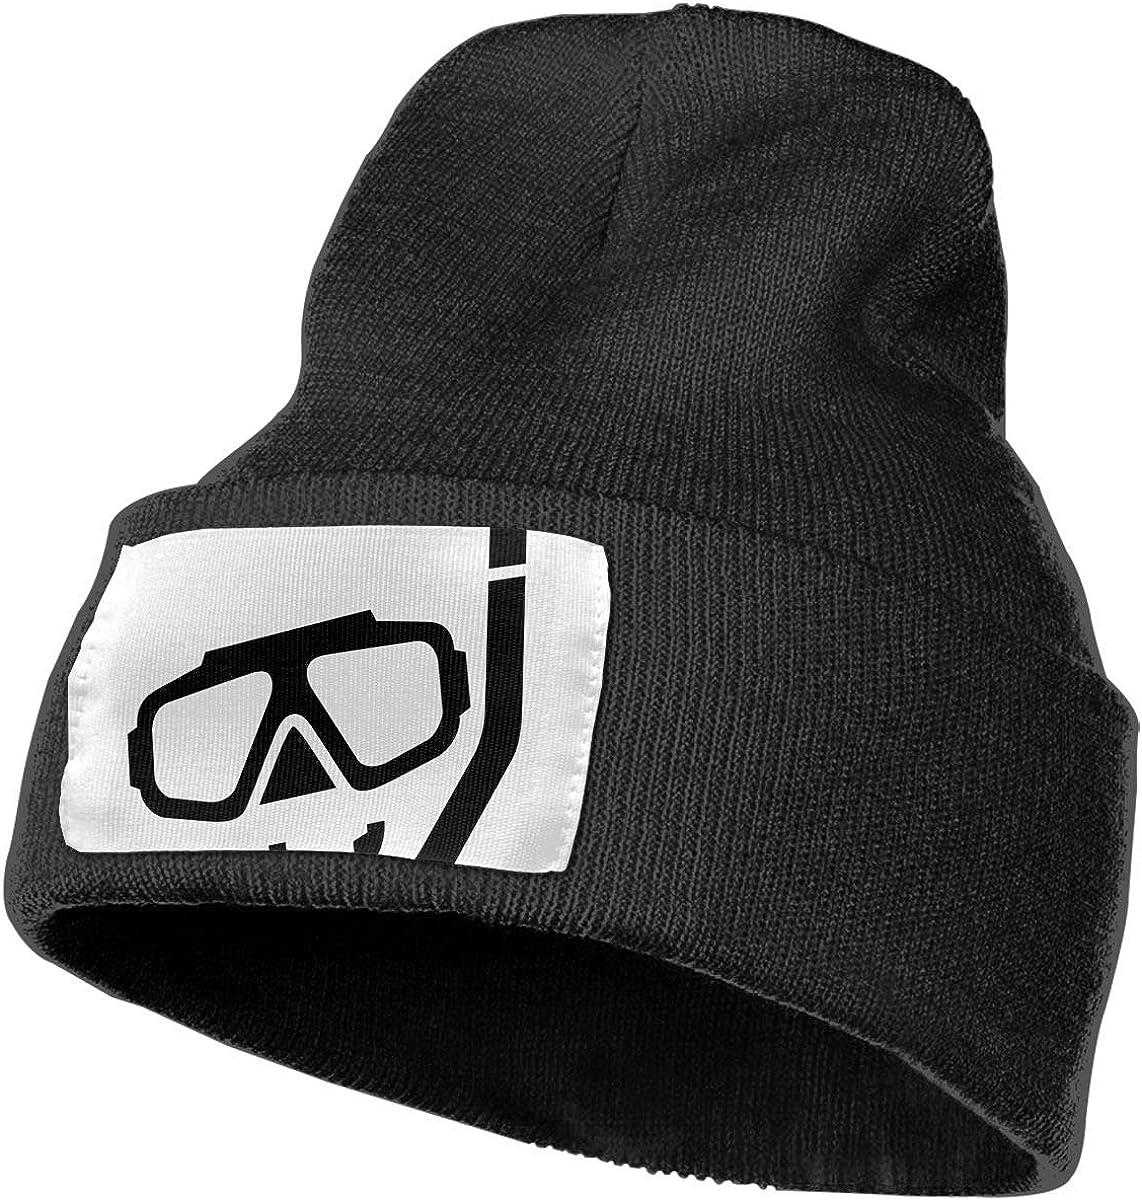 QZqDQ Diving Unisex Fashion Knitted Hat Luxury Hip-Hop Cap